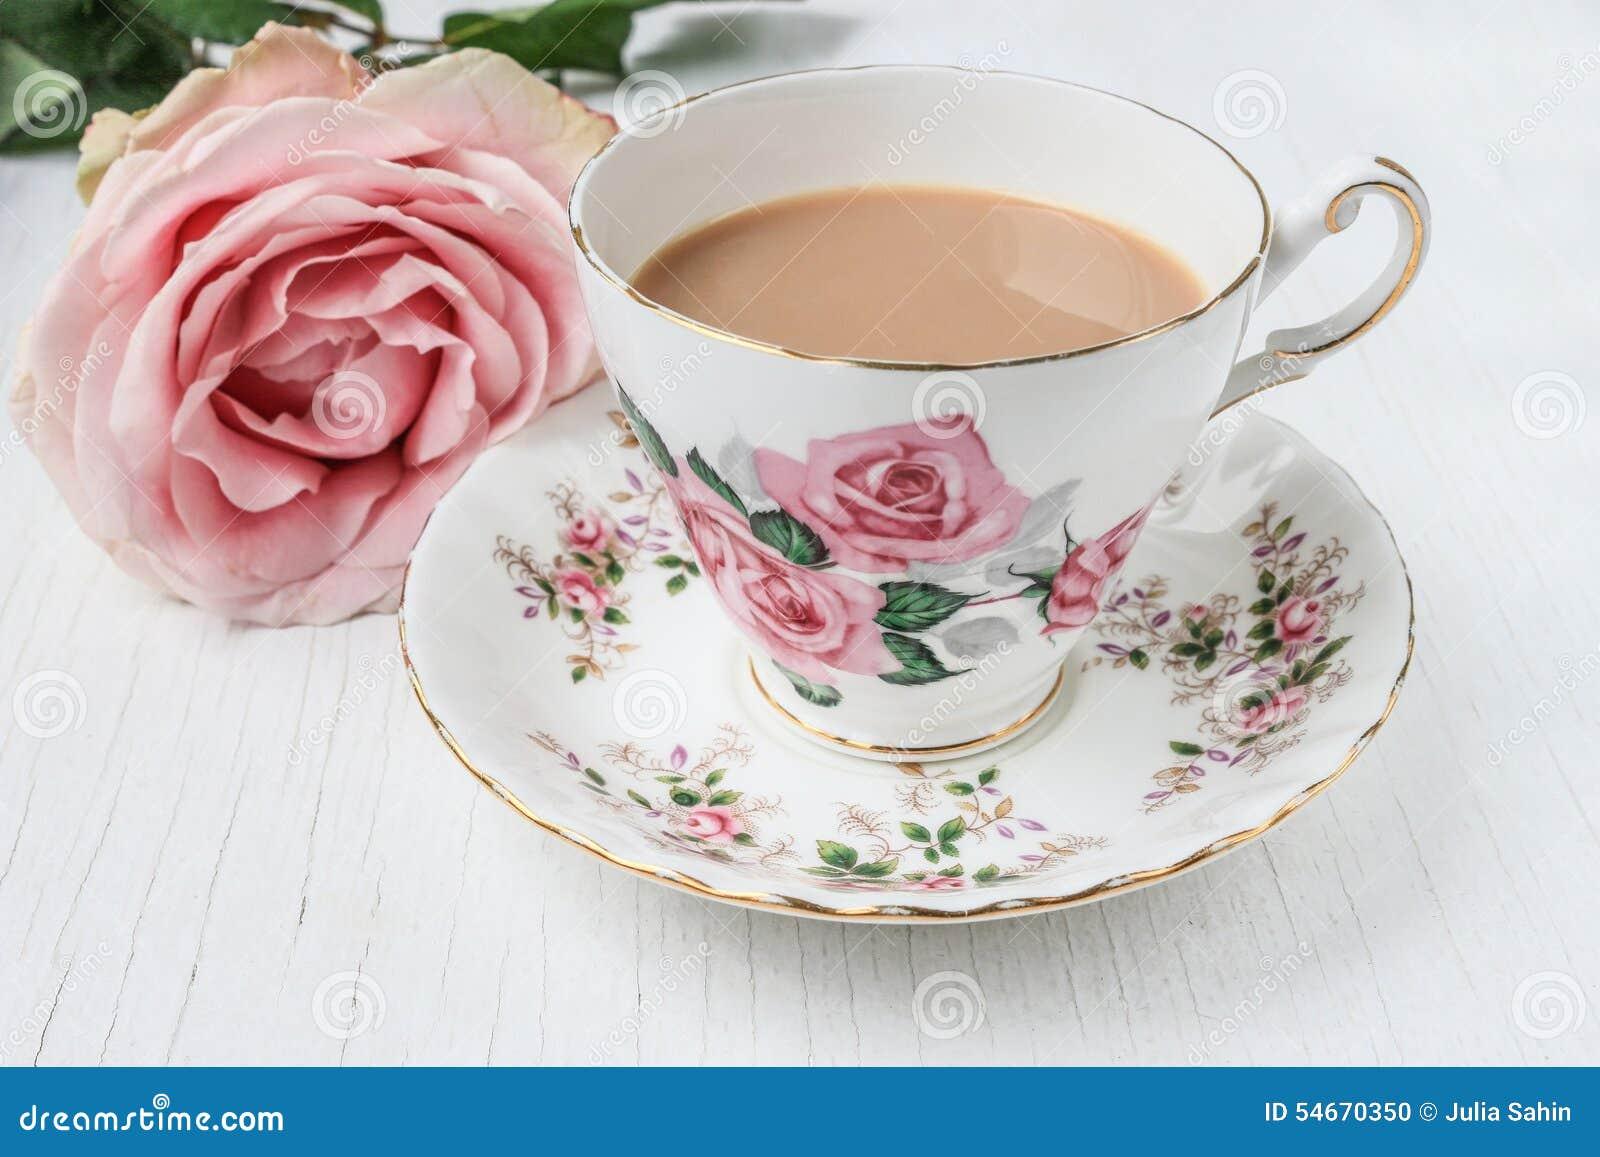 how to make white tea with milk